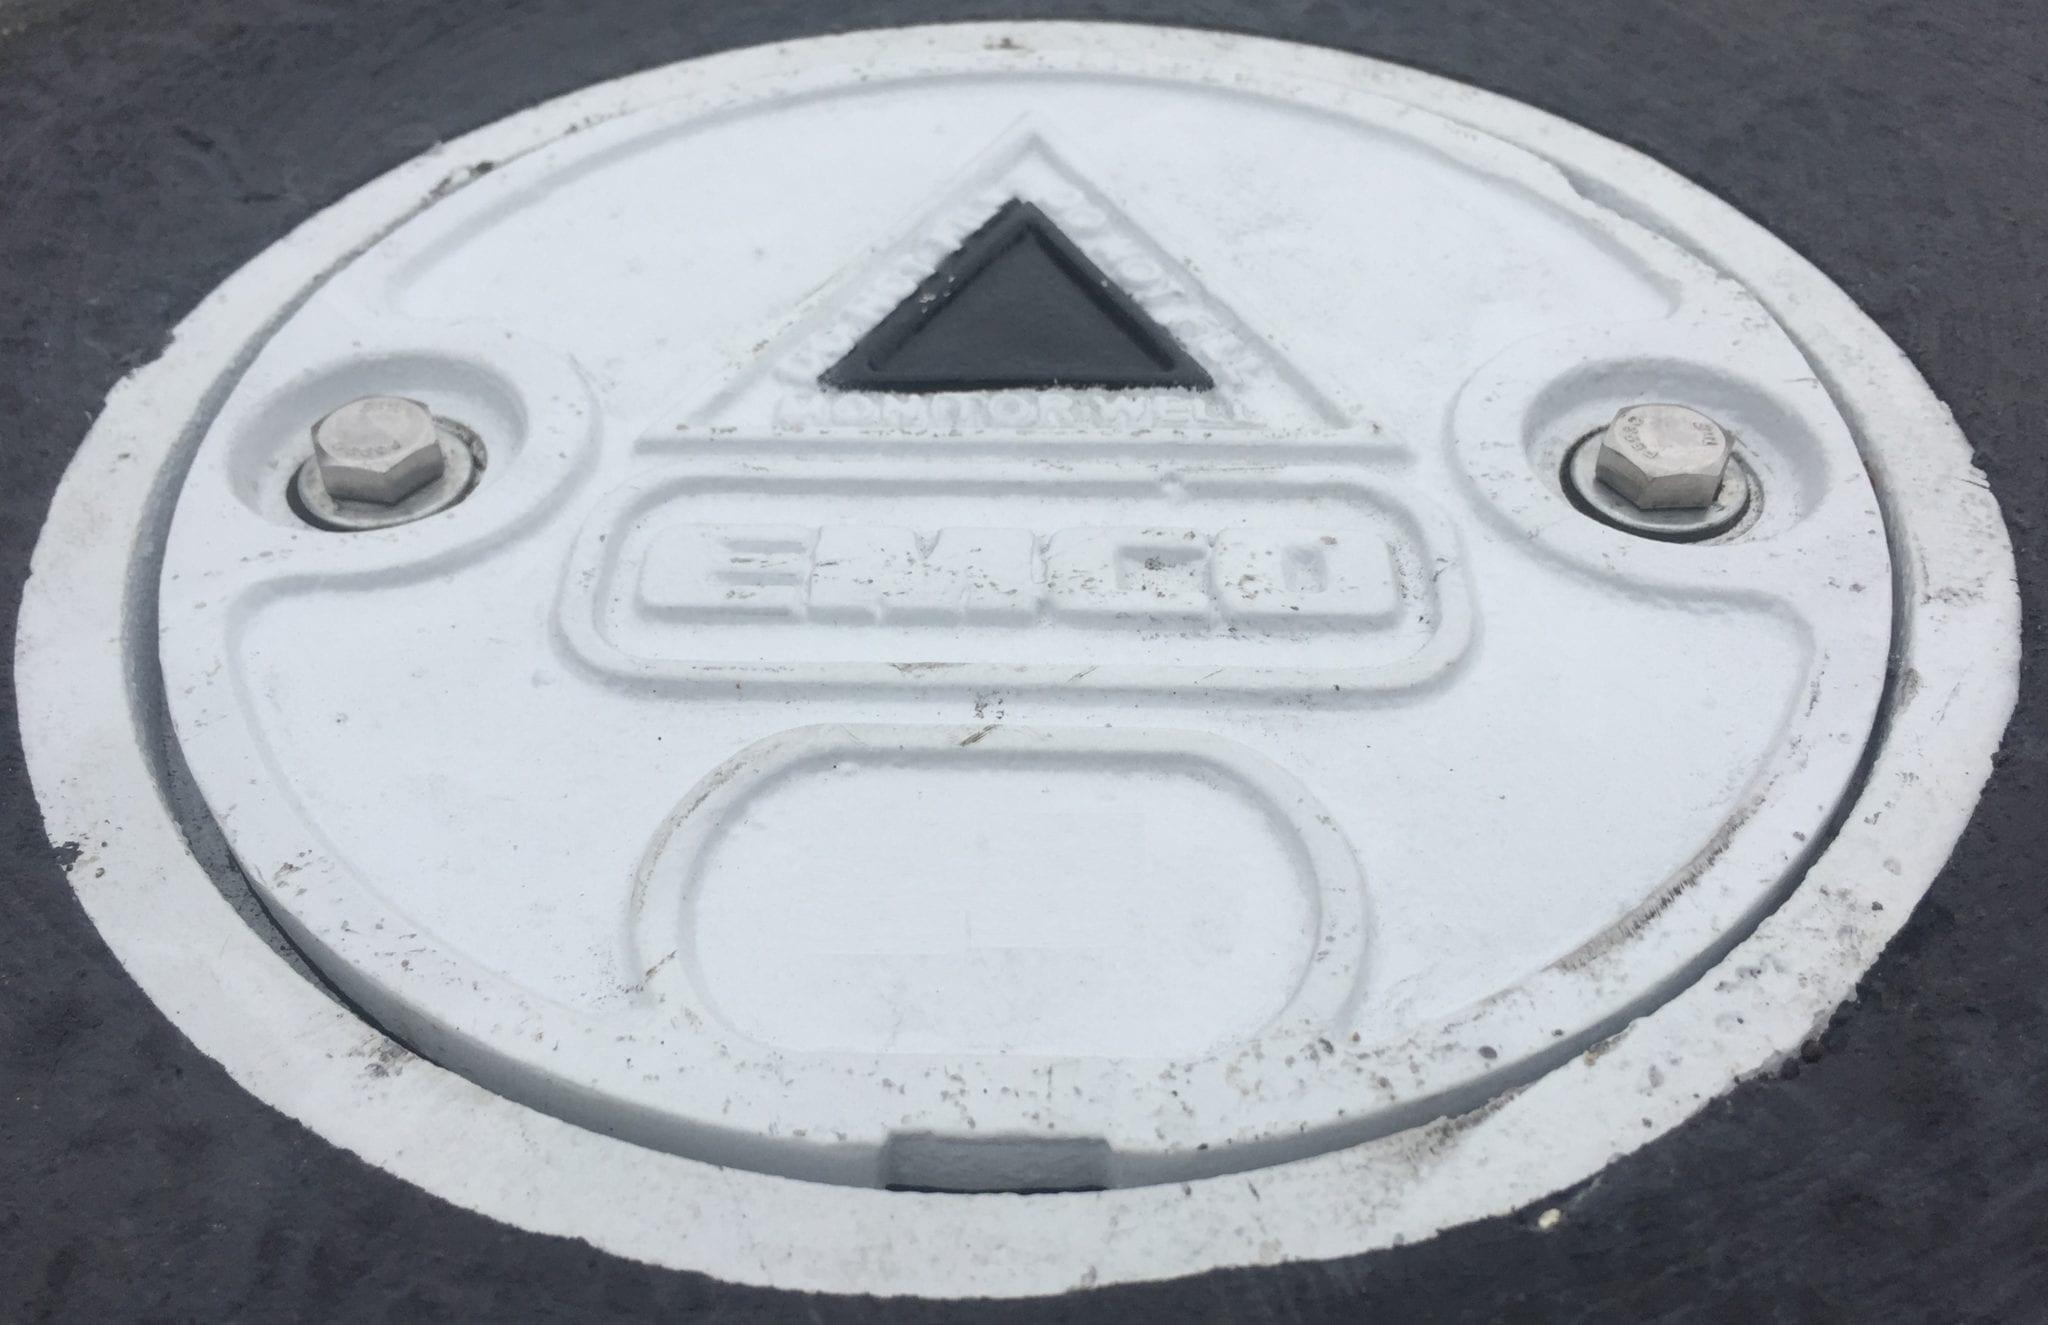 Environmental Remediation - Groundwater Monitoring Well Box